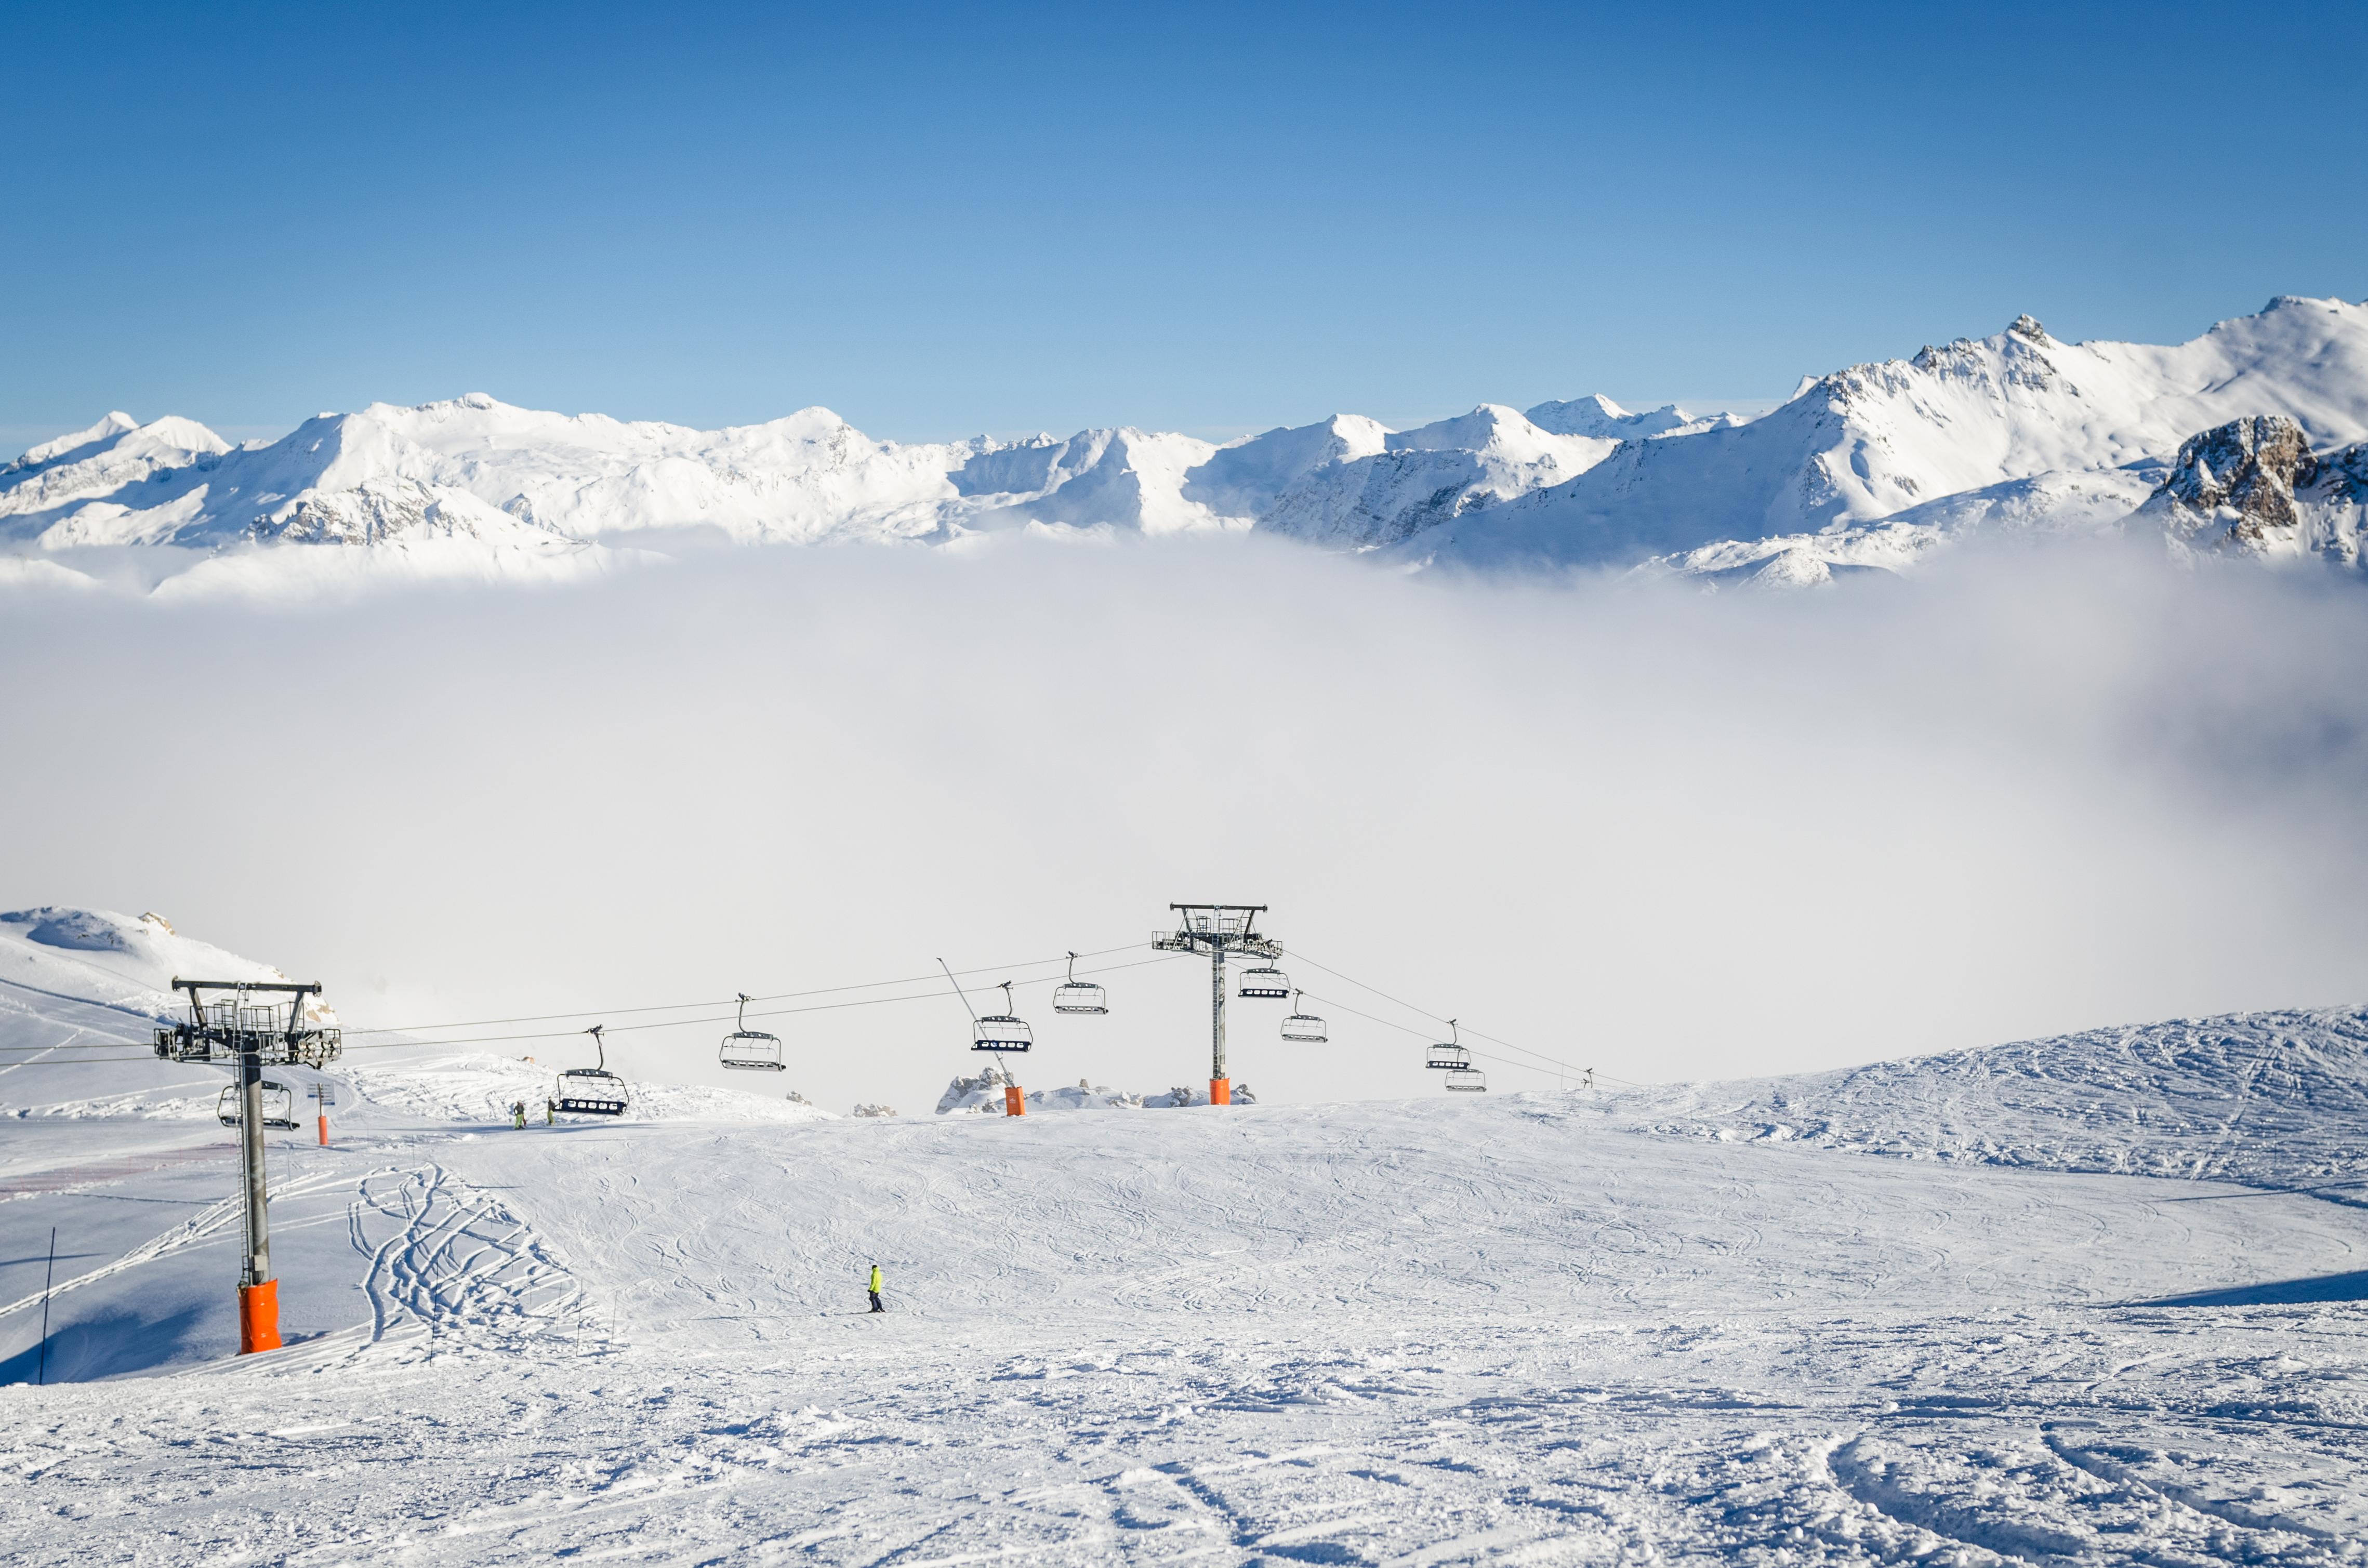 Expert ski instruction